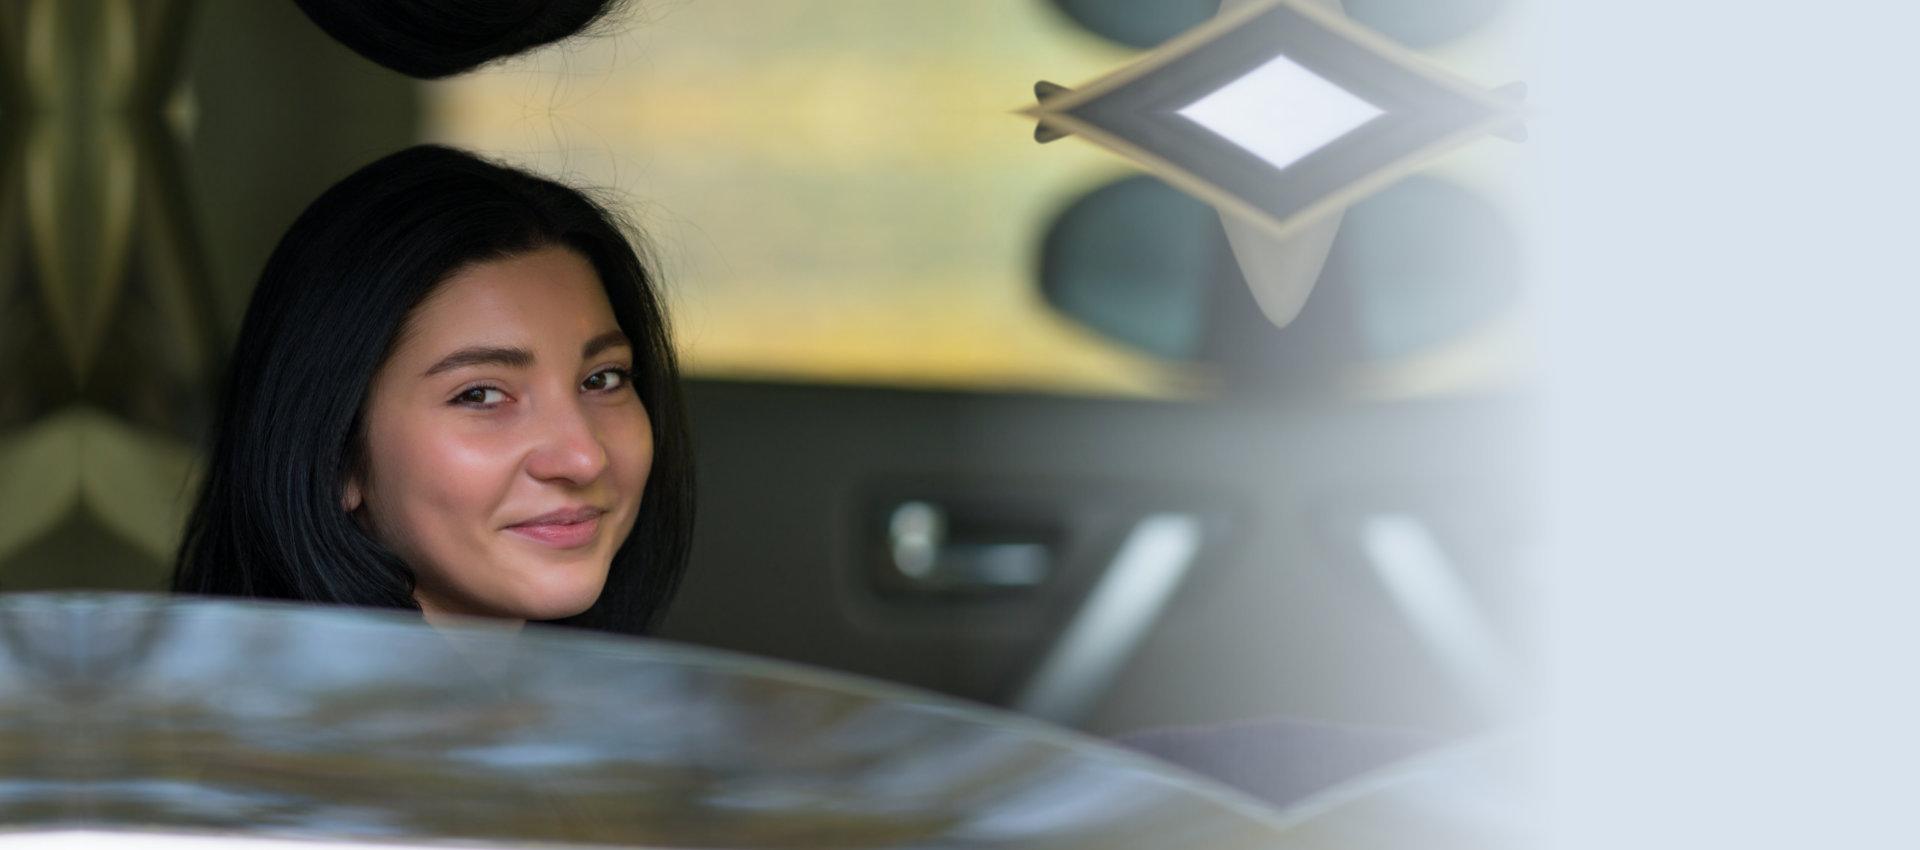 smiling woman inside car